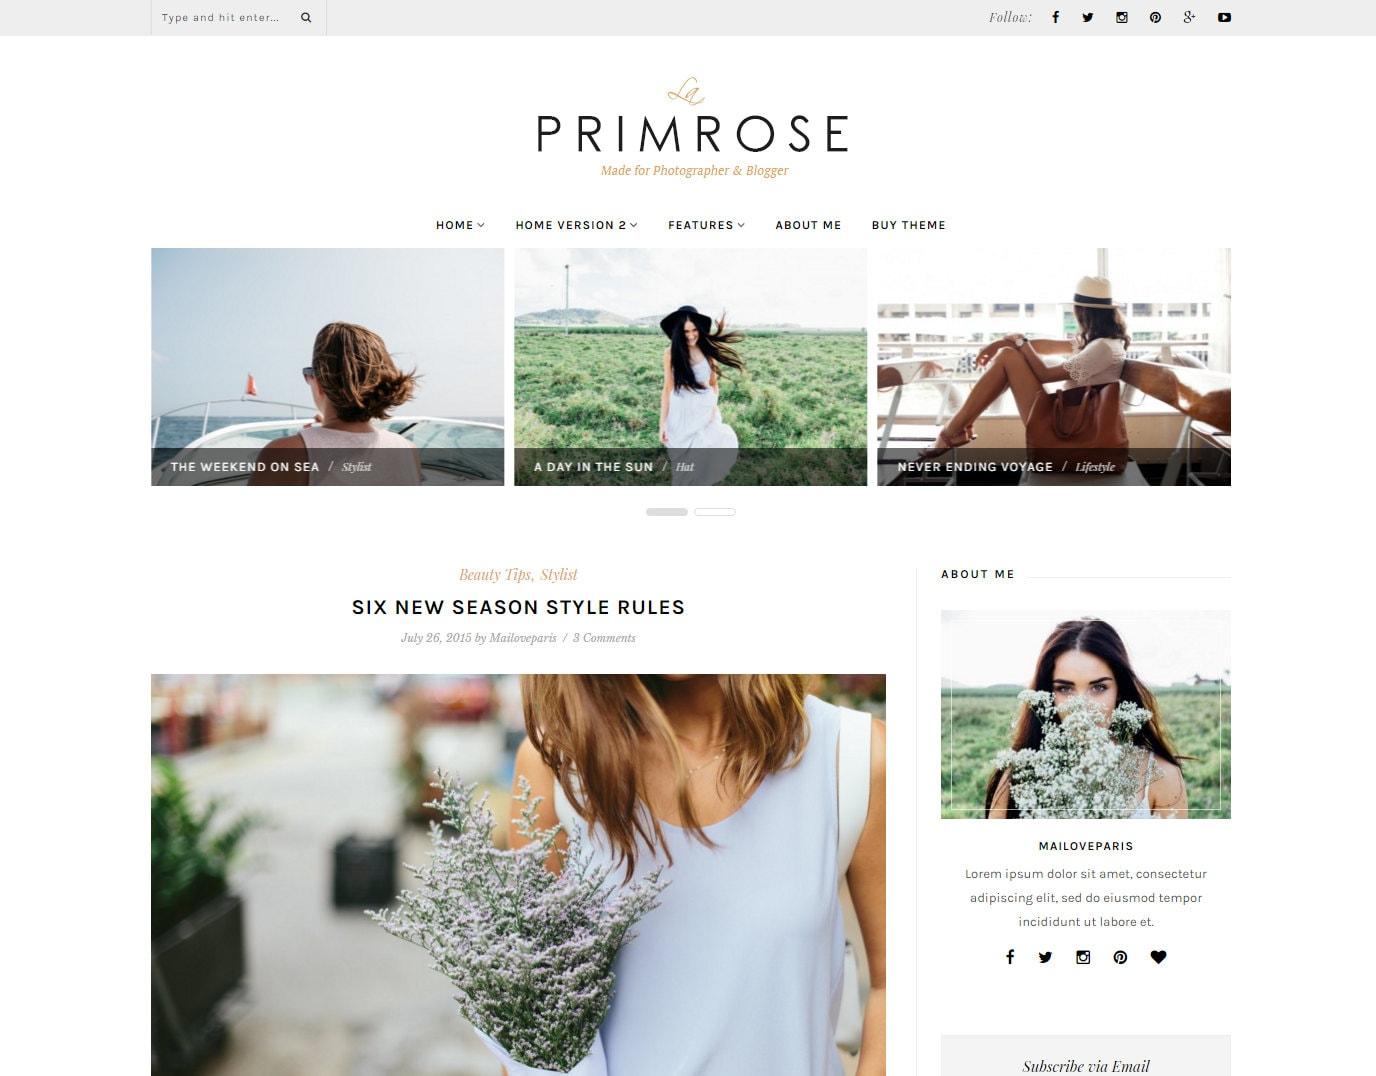 Wordpress theme wordpress template Feminine wordpress theme